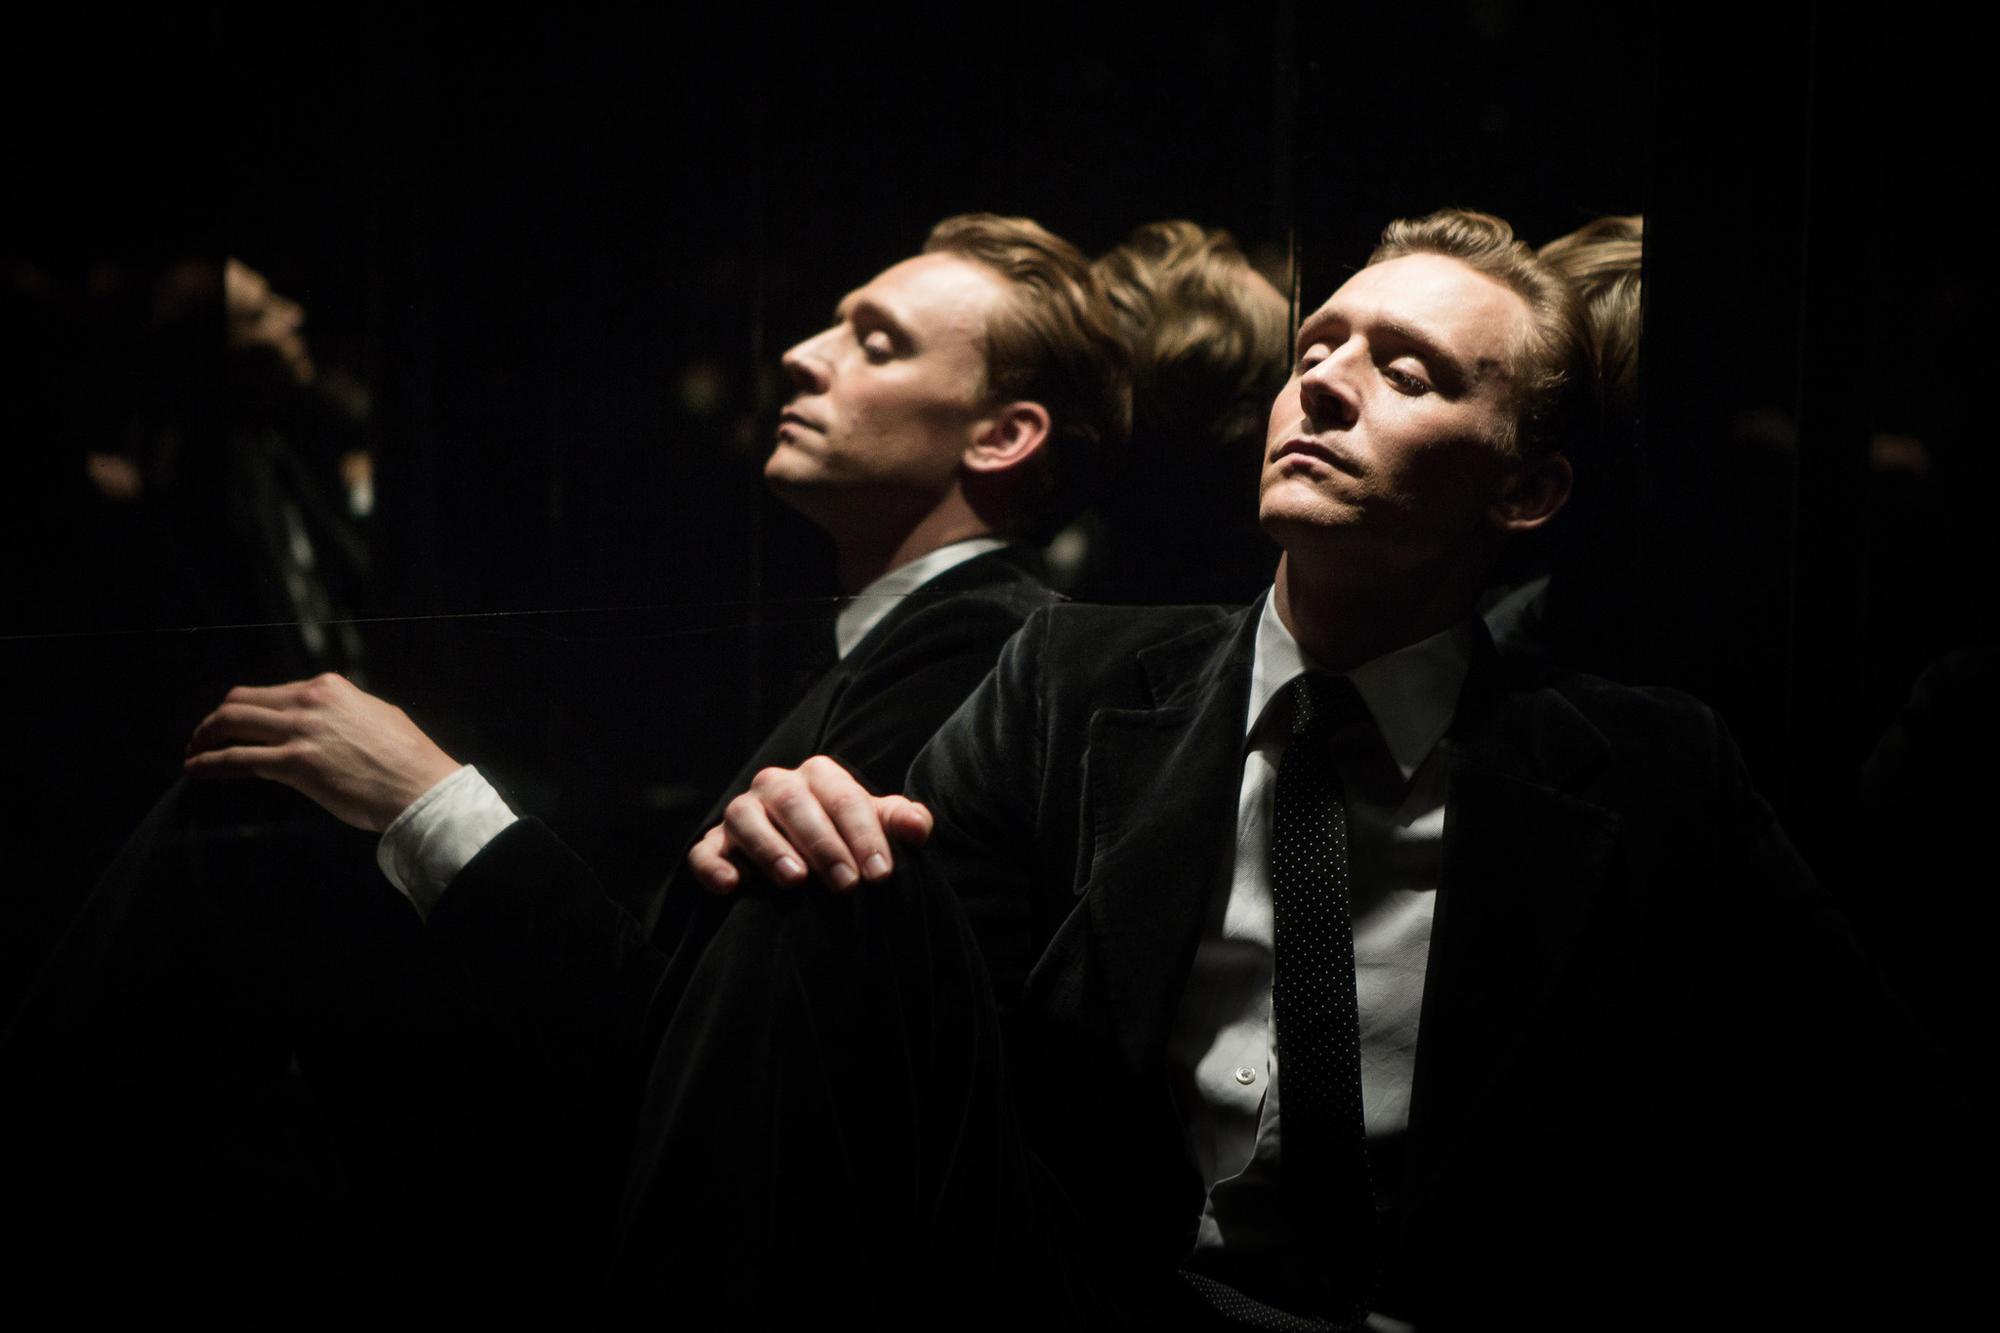 Tom Hiddleston in